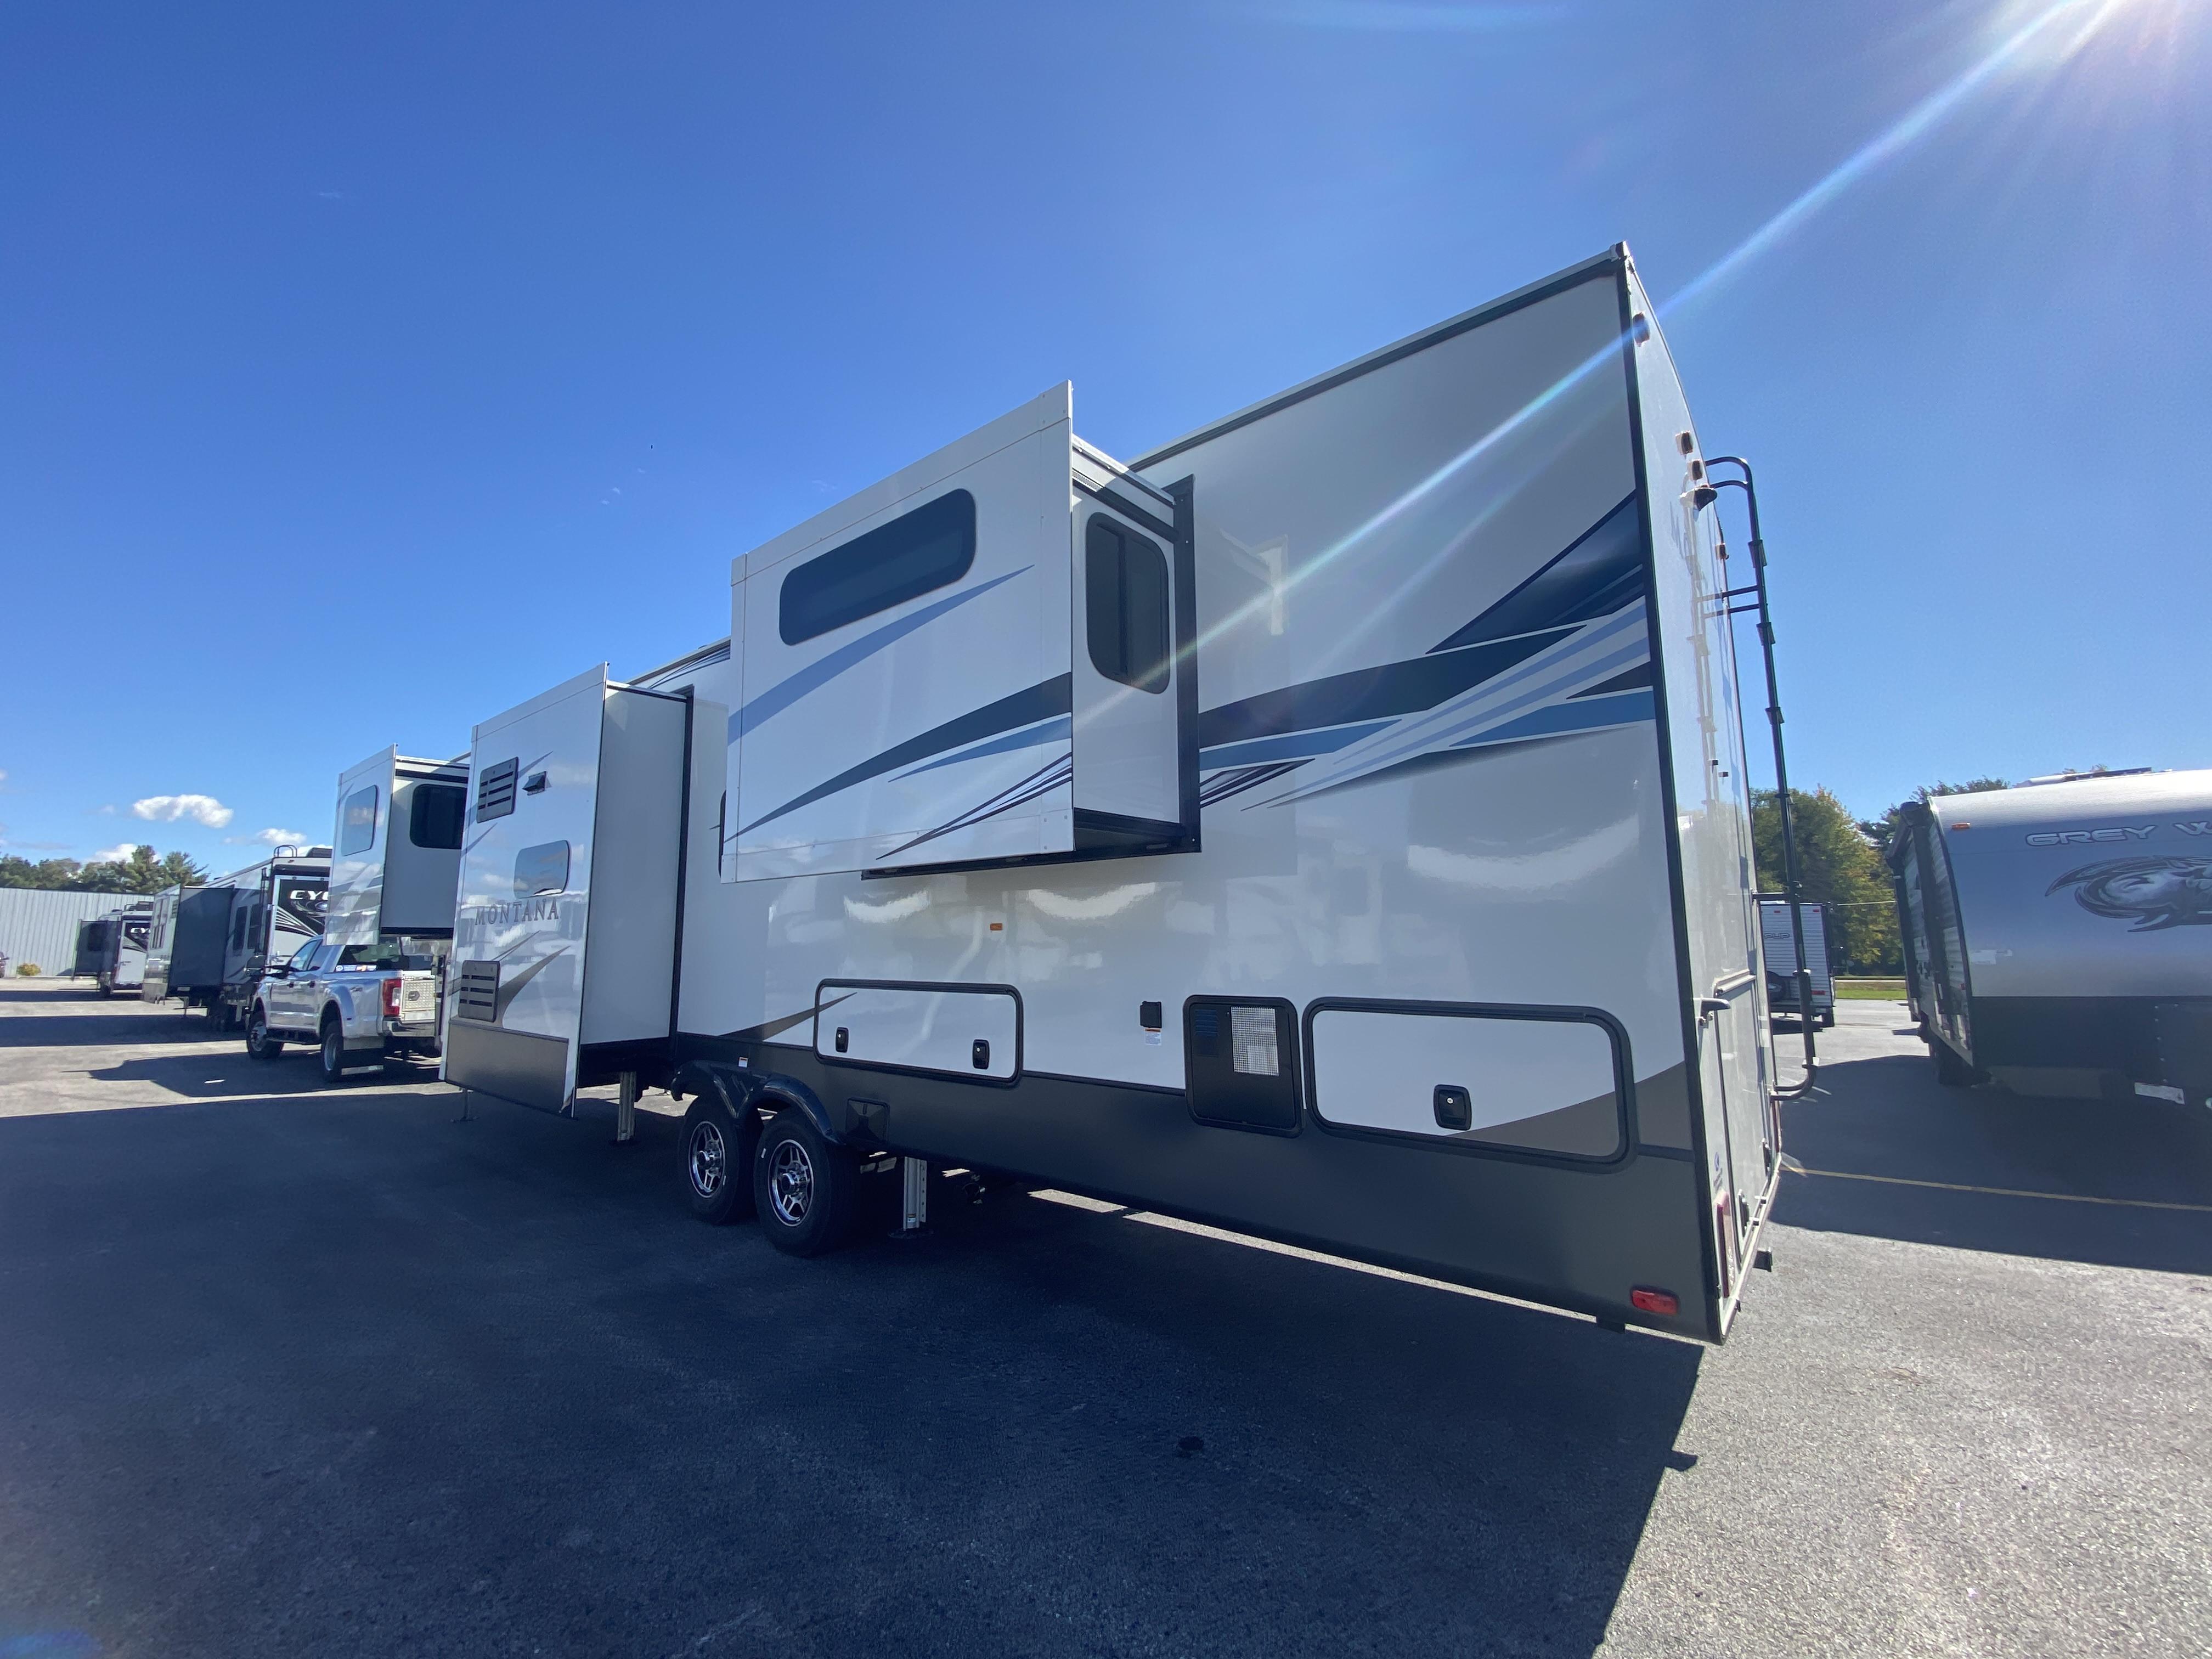 thumbnail 6 - 2021 Keystone Montana 3762BP Camper